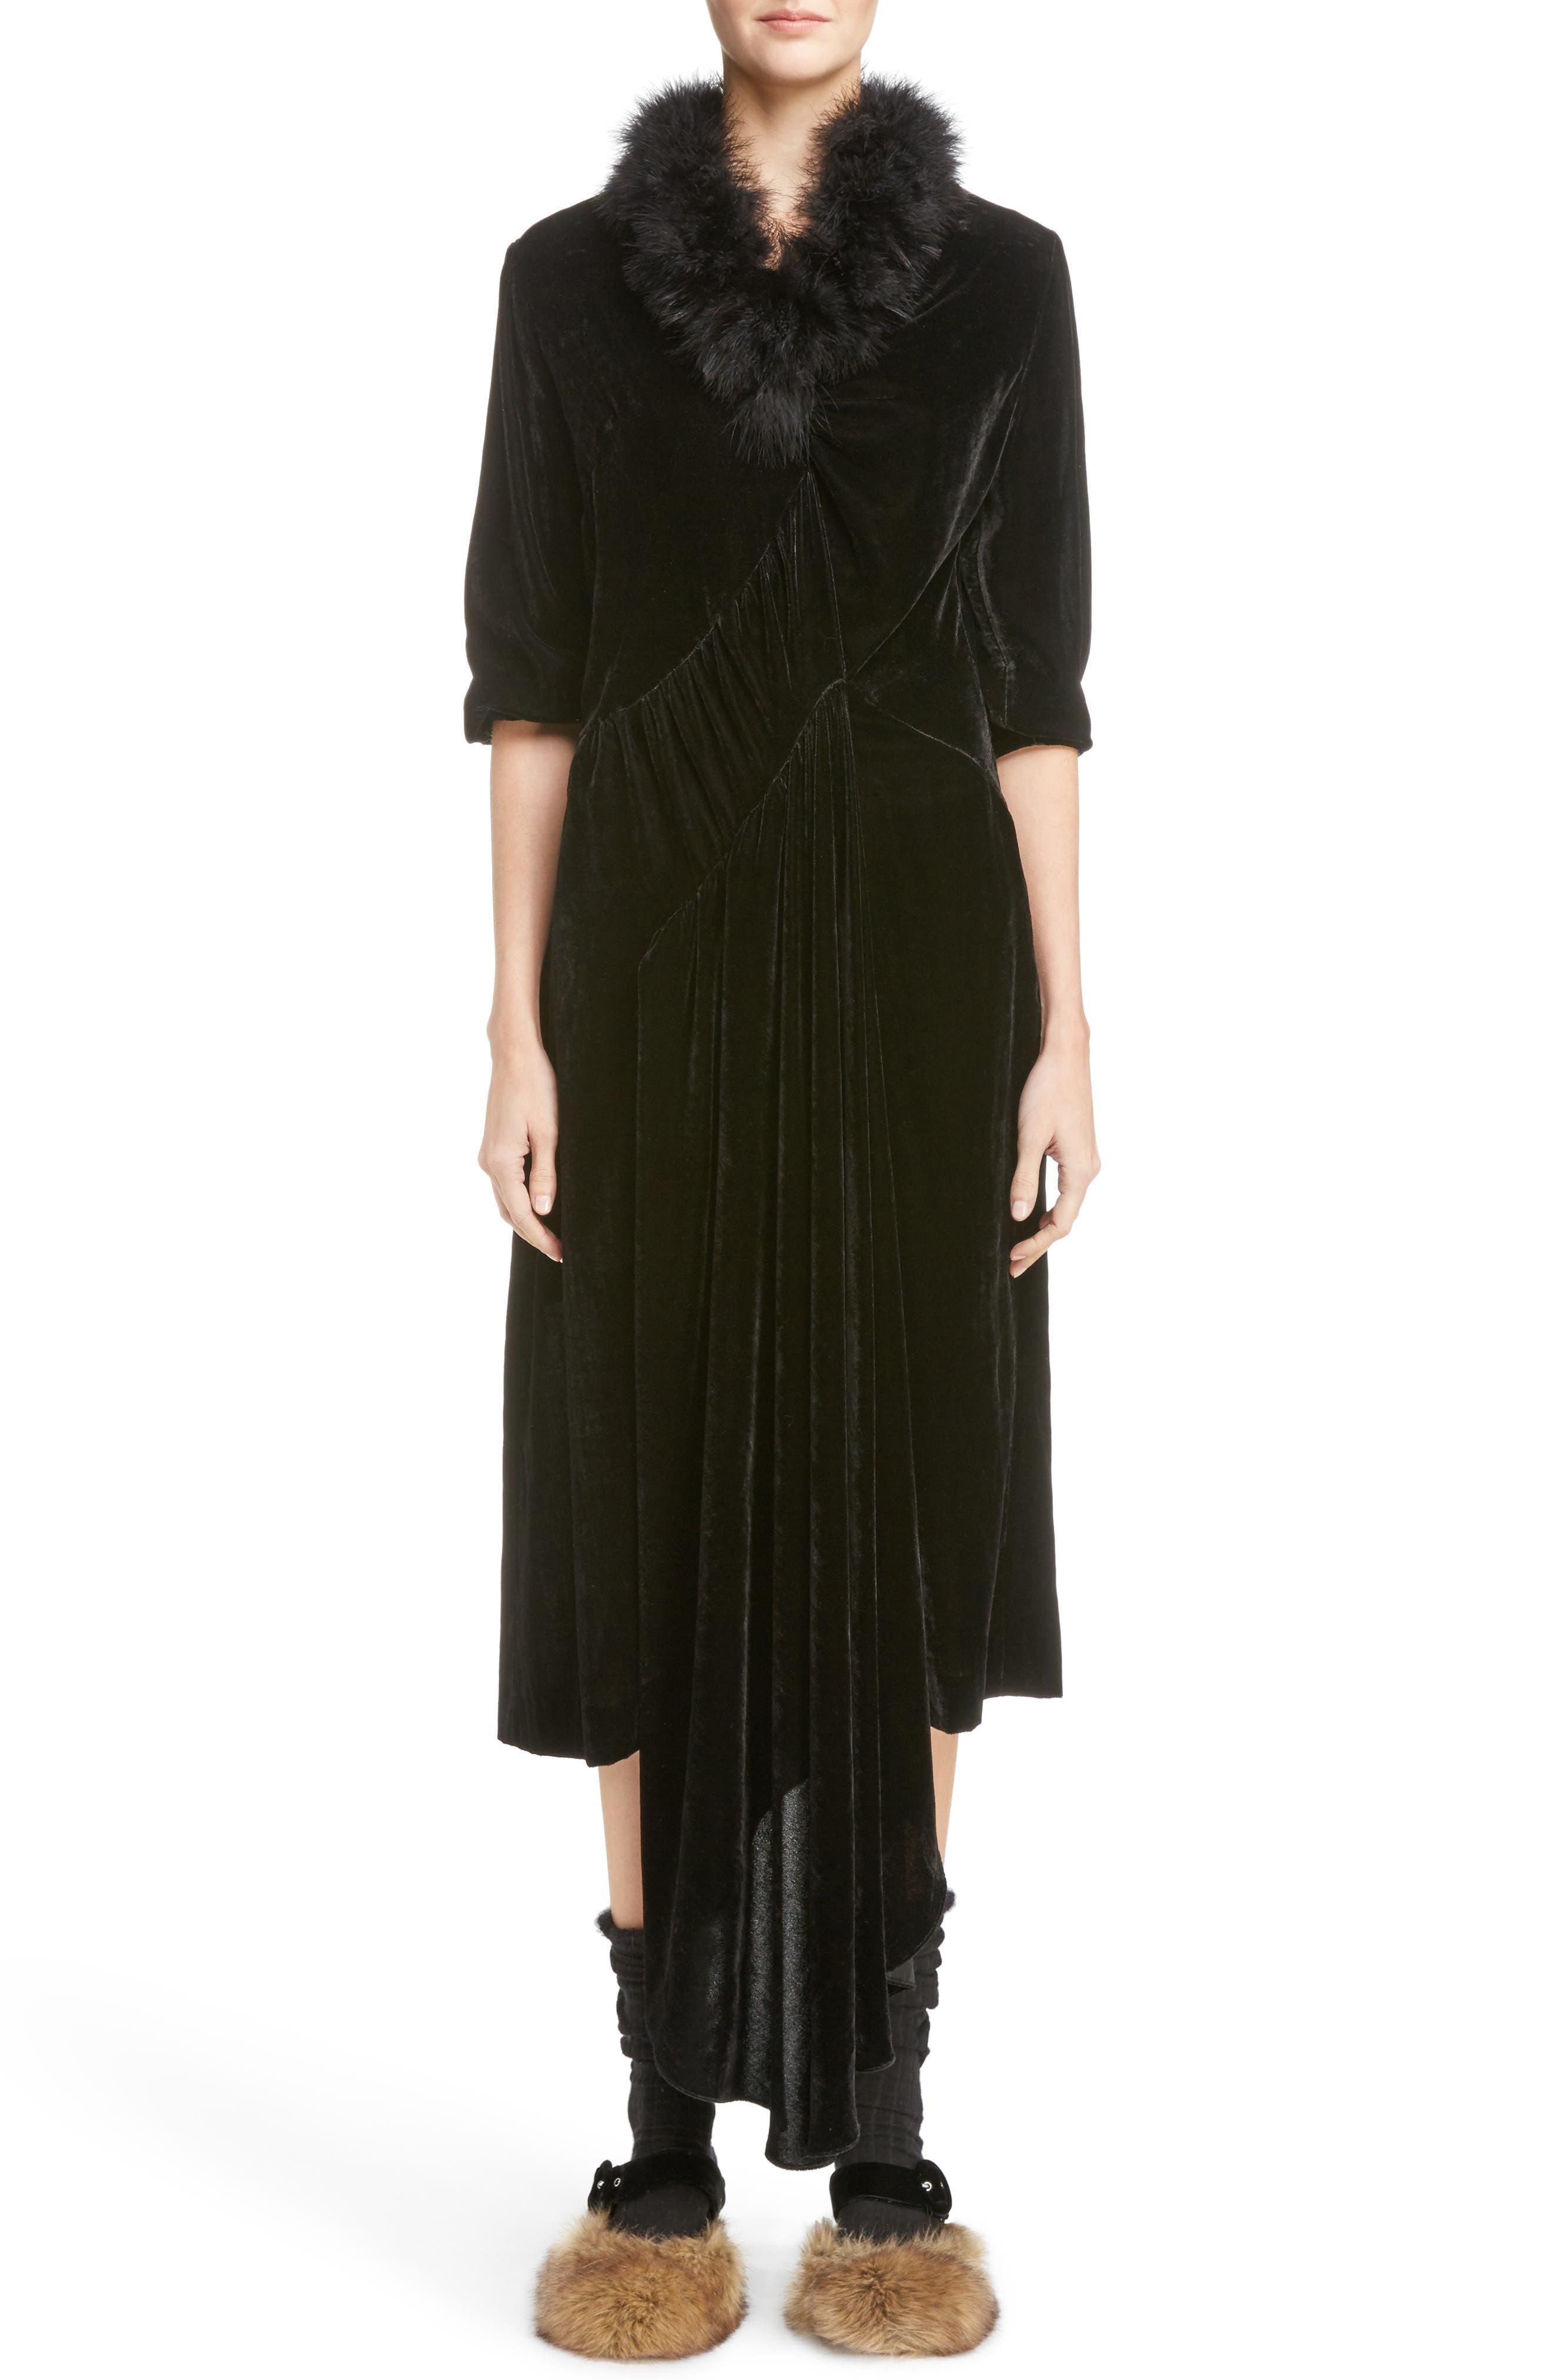 SIMONE ROCHA Asymmetrical Velvet Dress with Marabou Trim